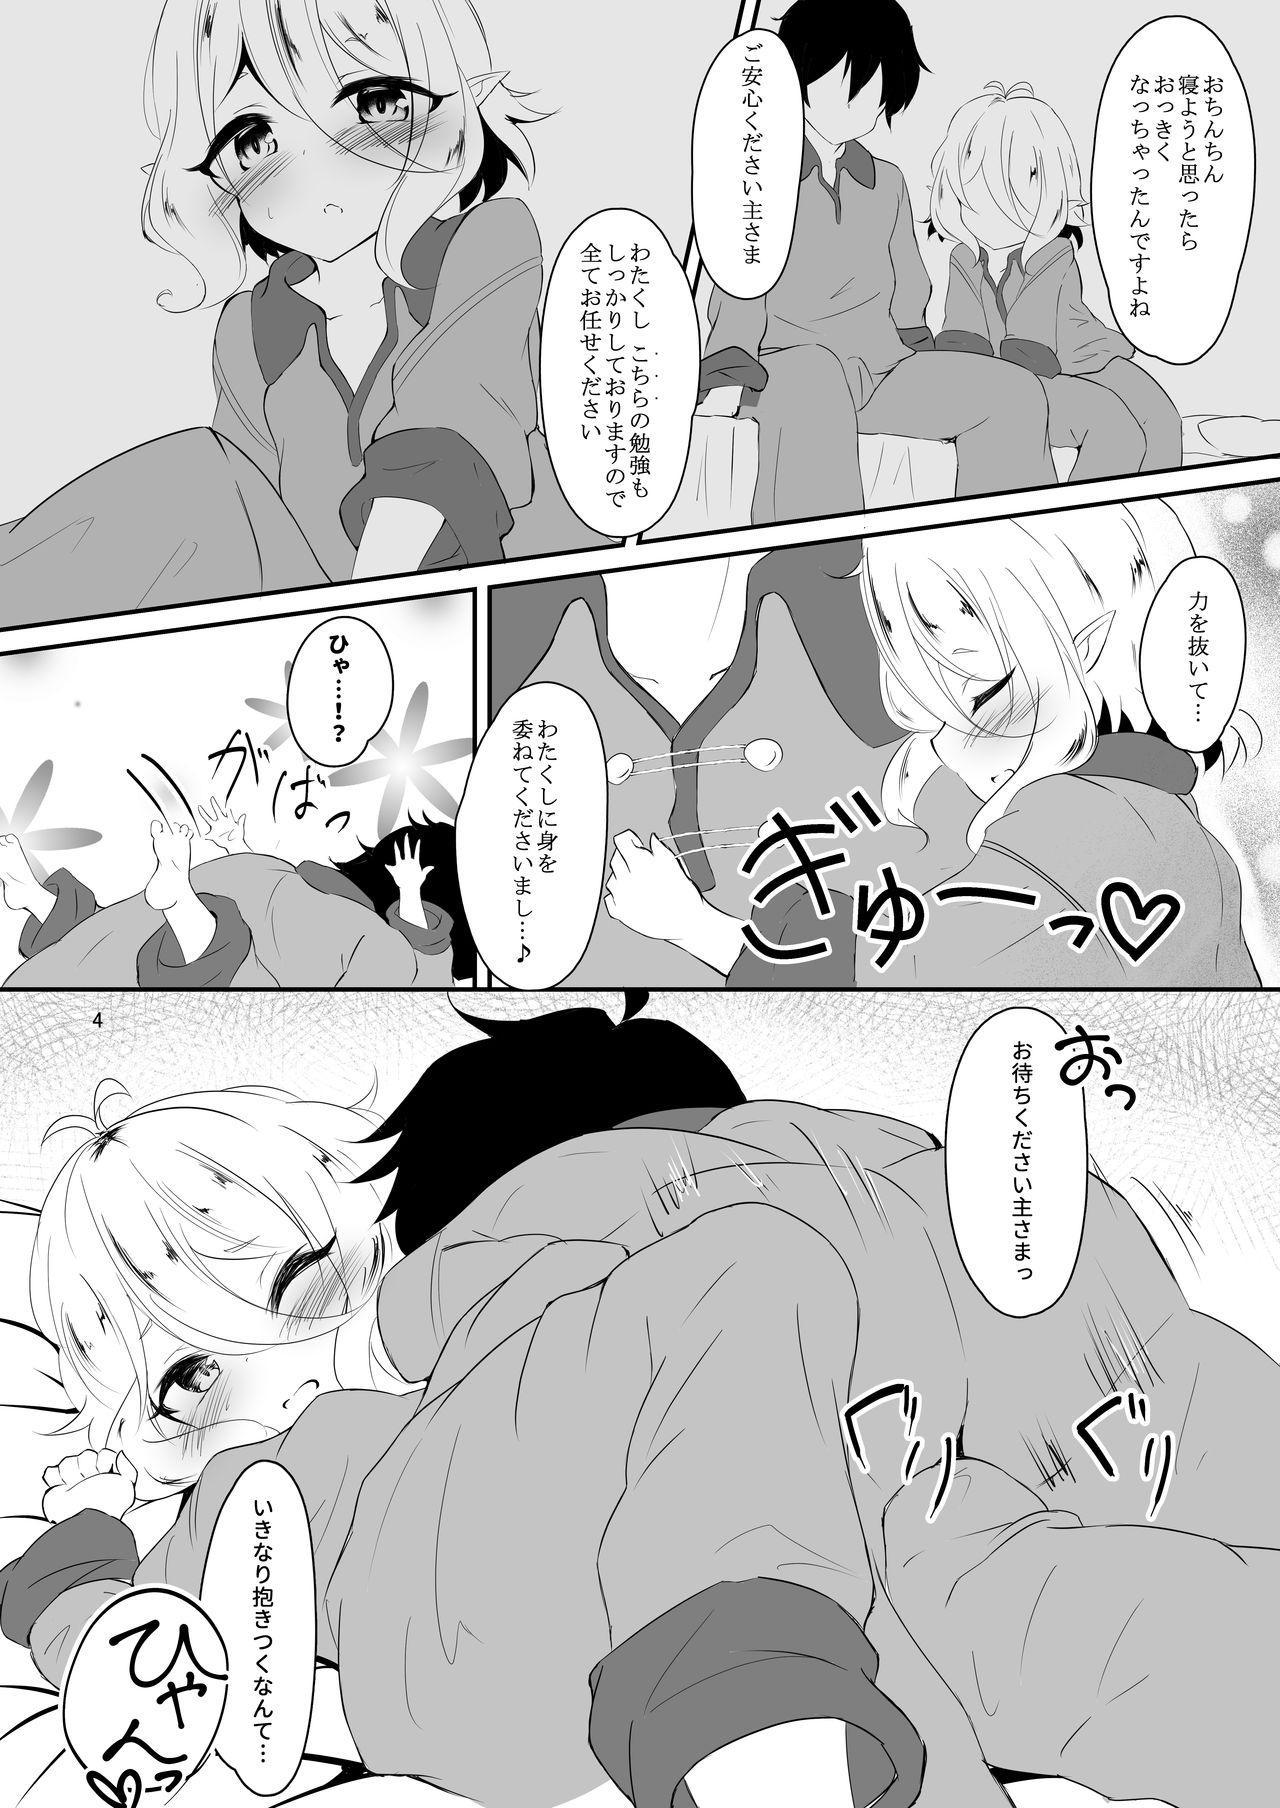 Kokkoro to Hajimete Ecchi! 2